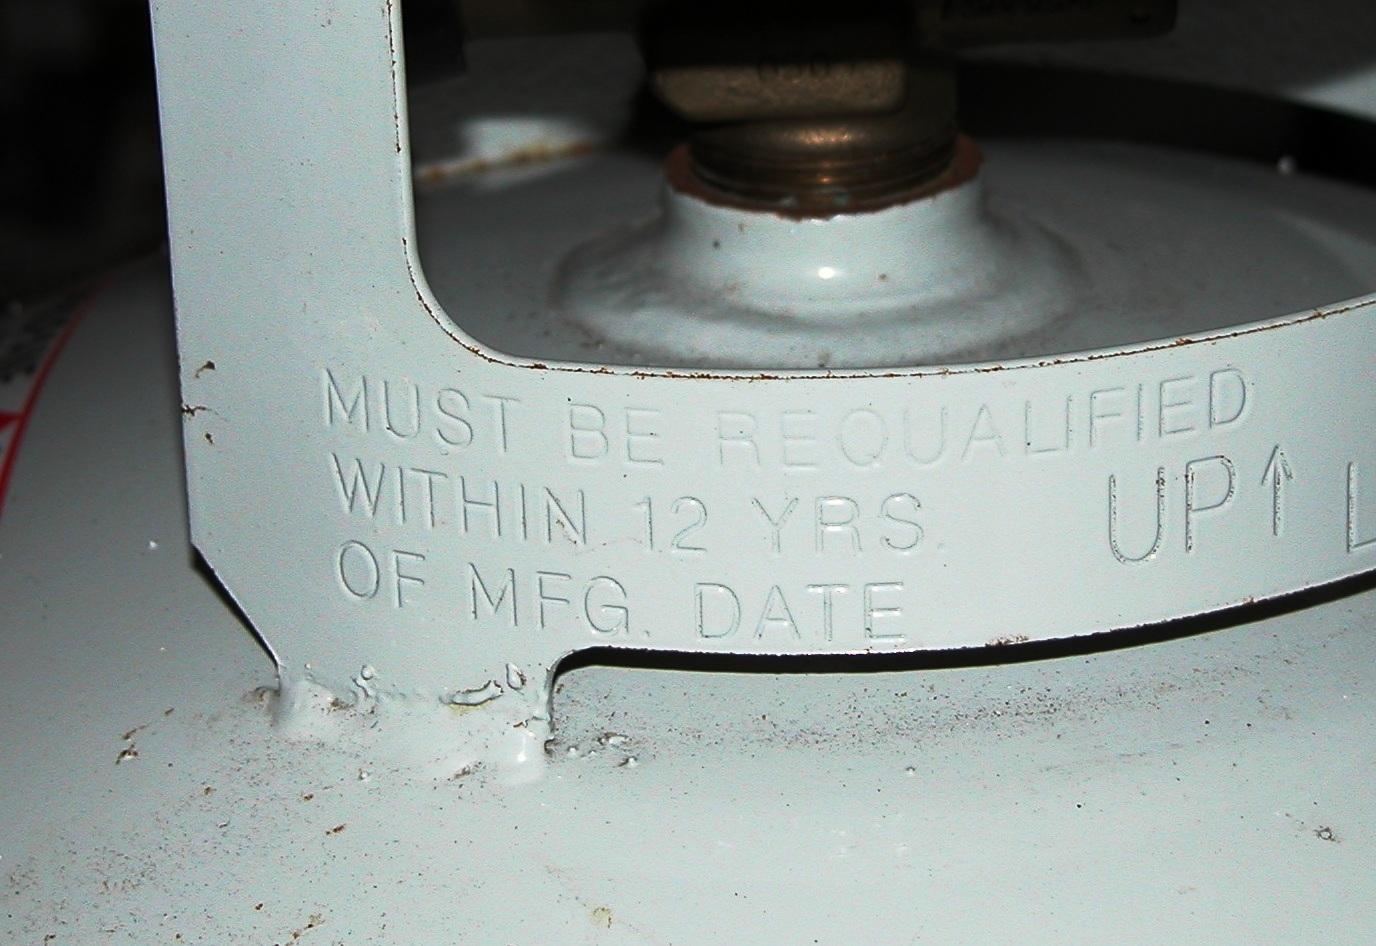 Propane tank date code